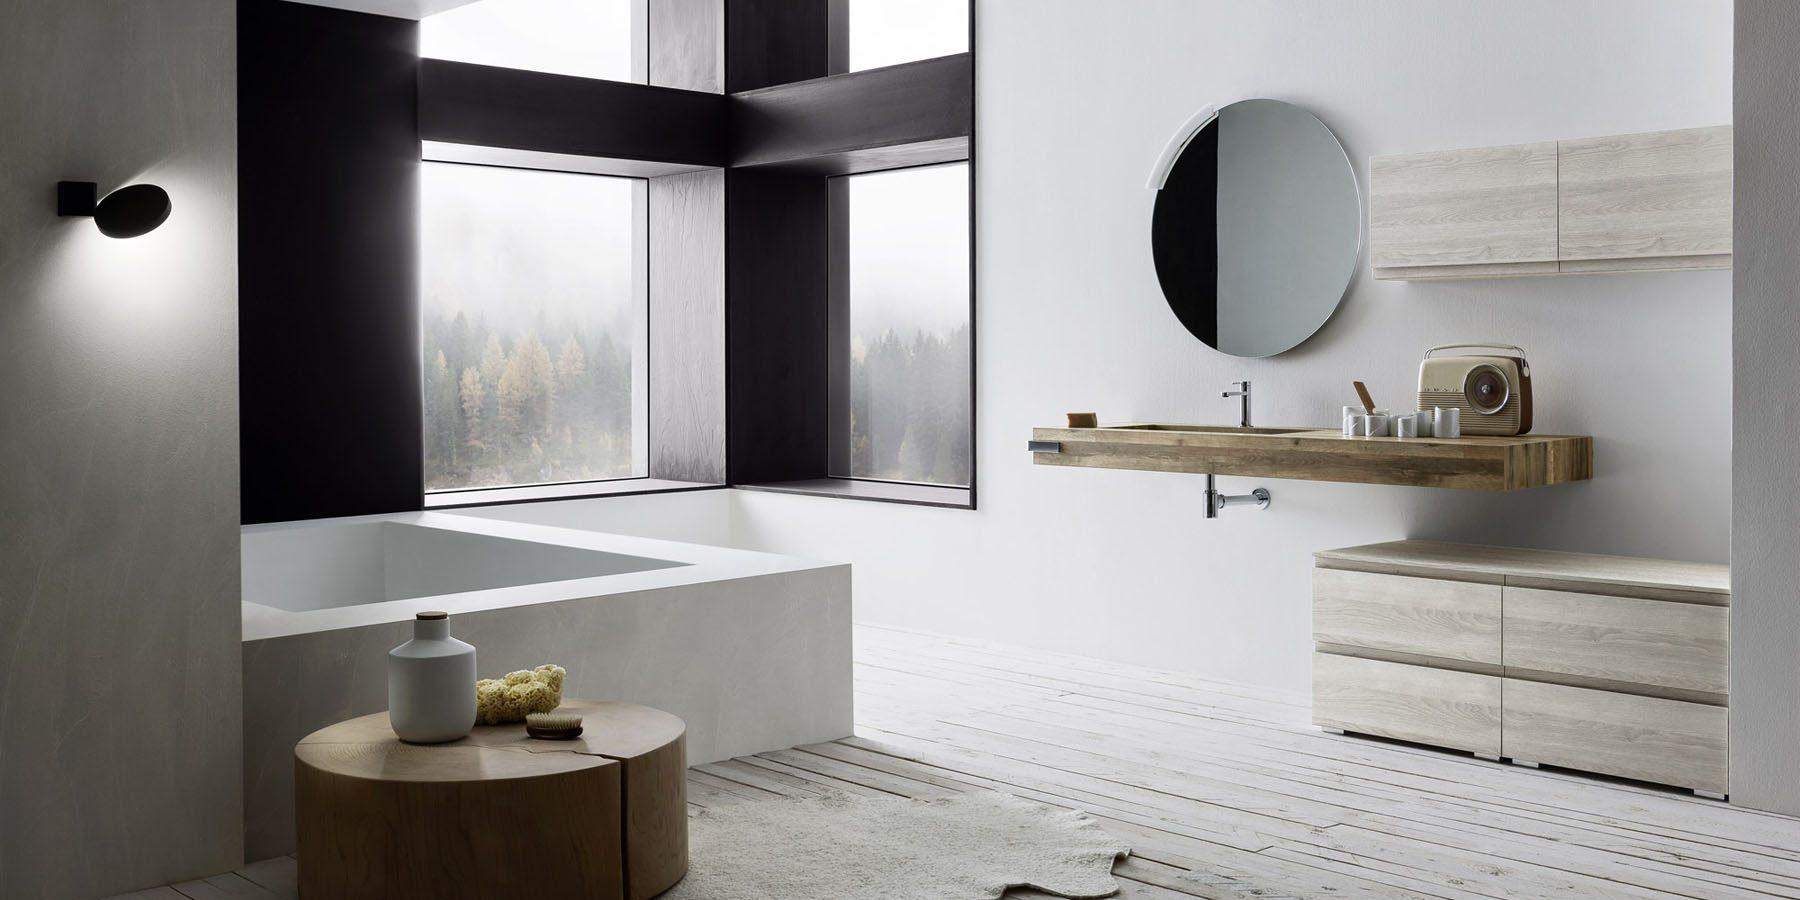 Arredo bagno mobili bagno centro mobili godiasco salice terme pv - Mobili bagno arbi prezzi ...